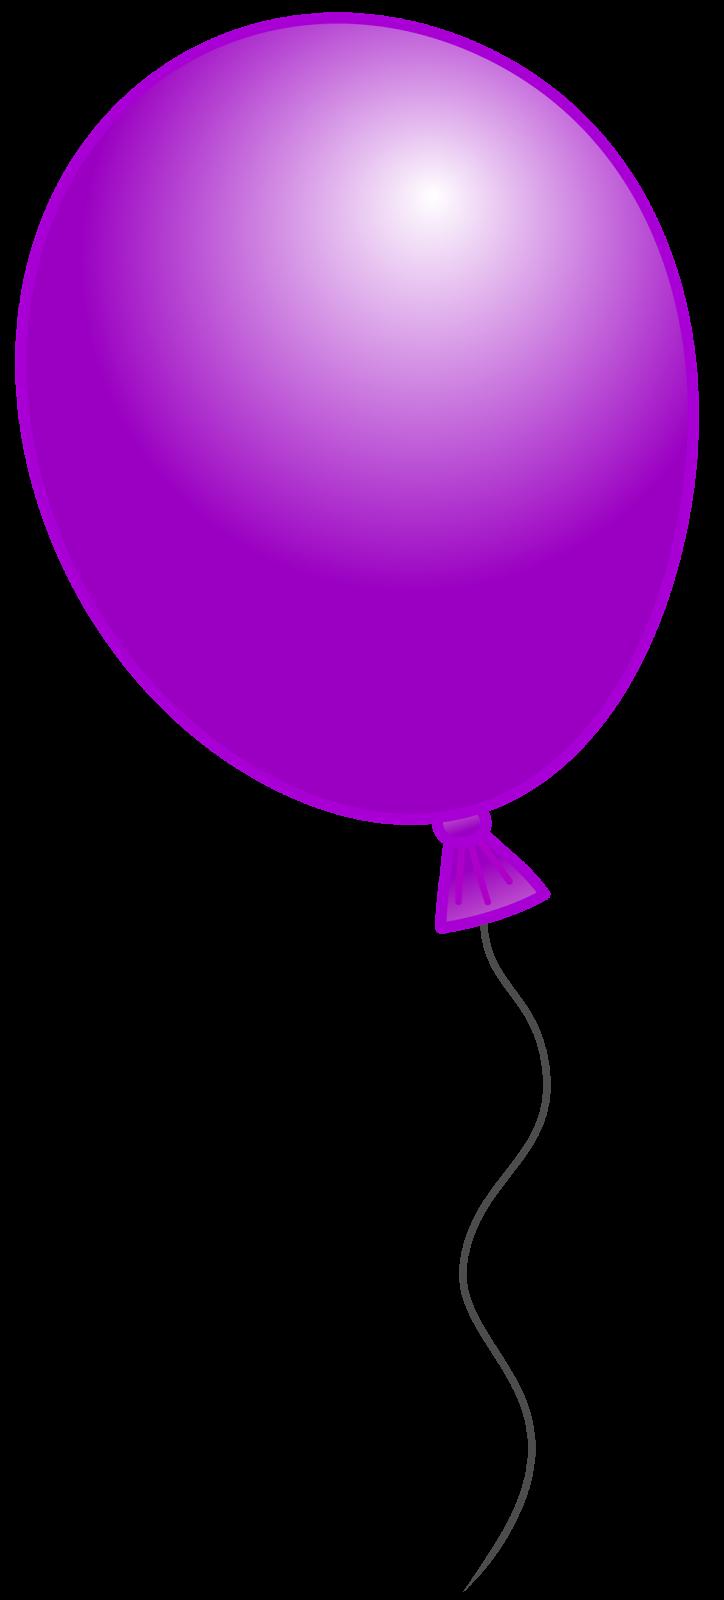 Purple Balloon Clipart - Clipart Suggest